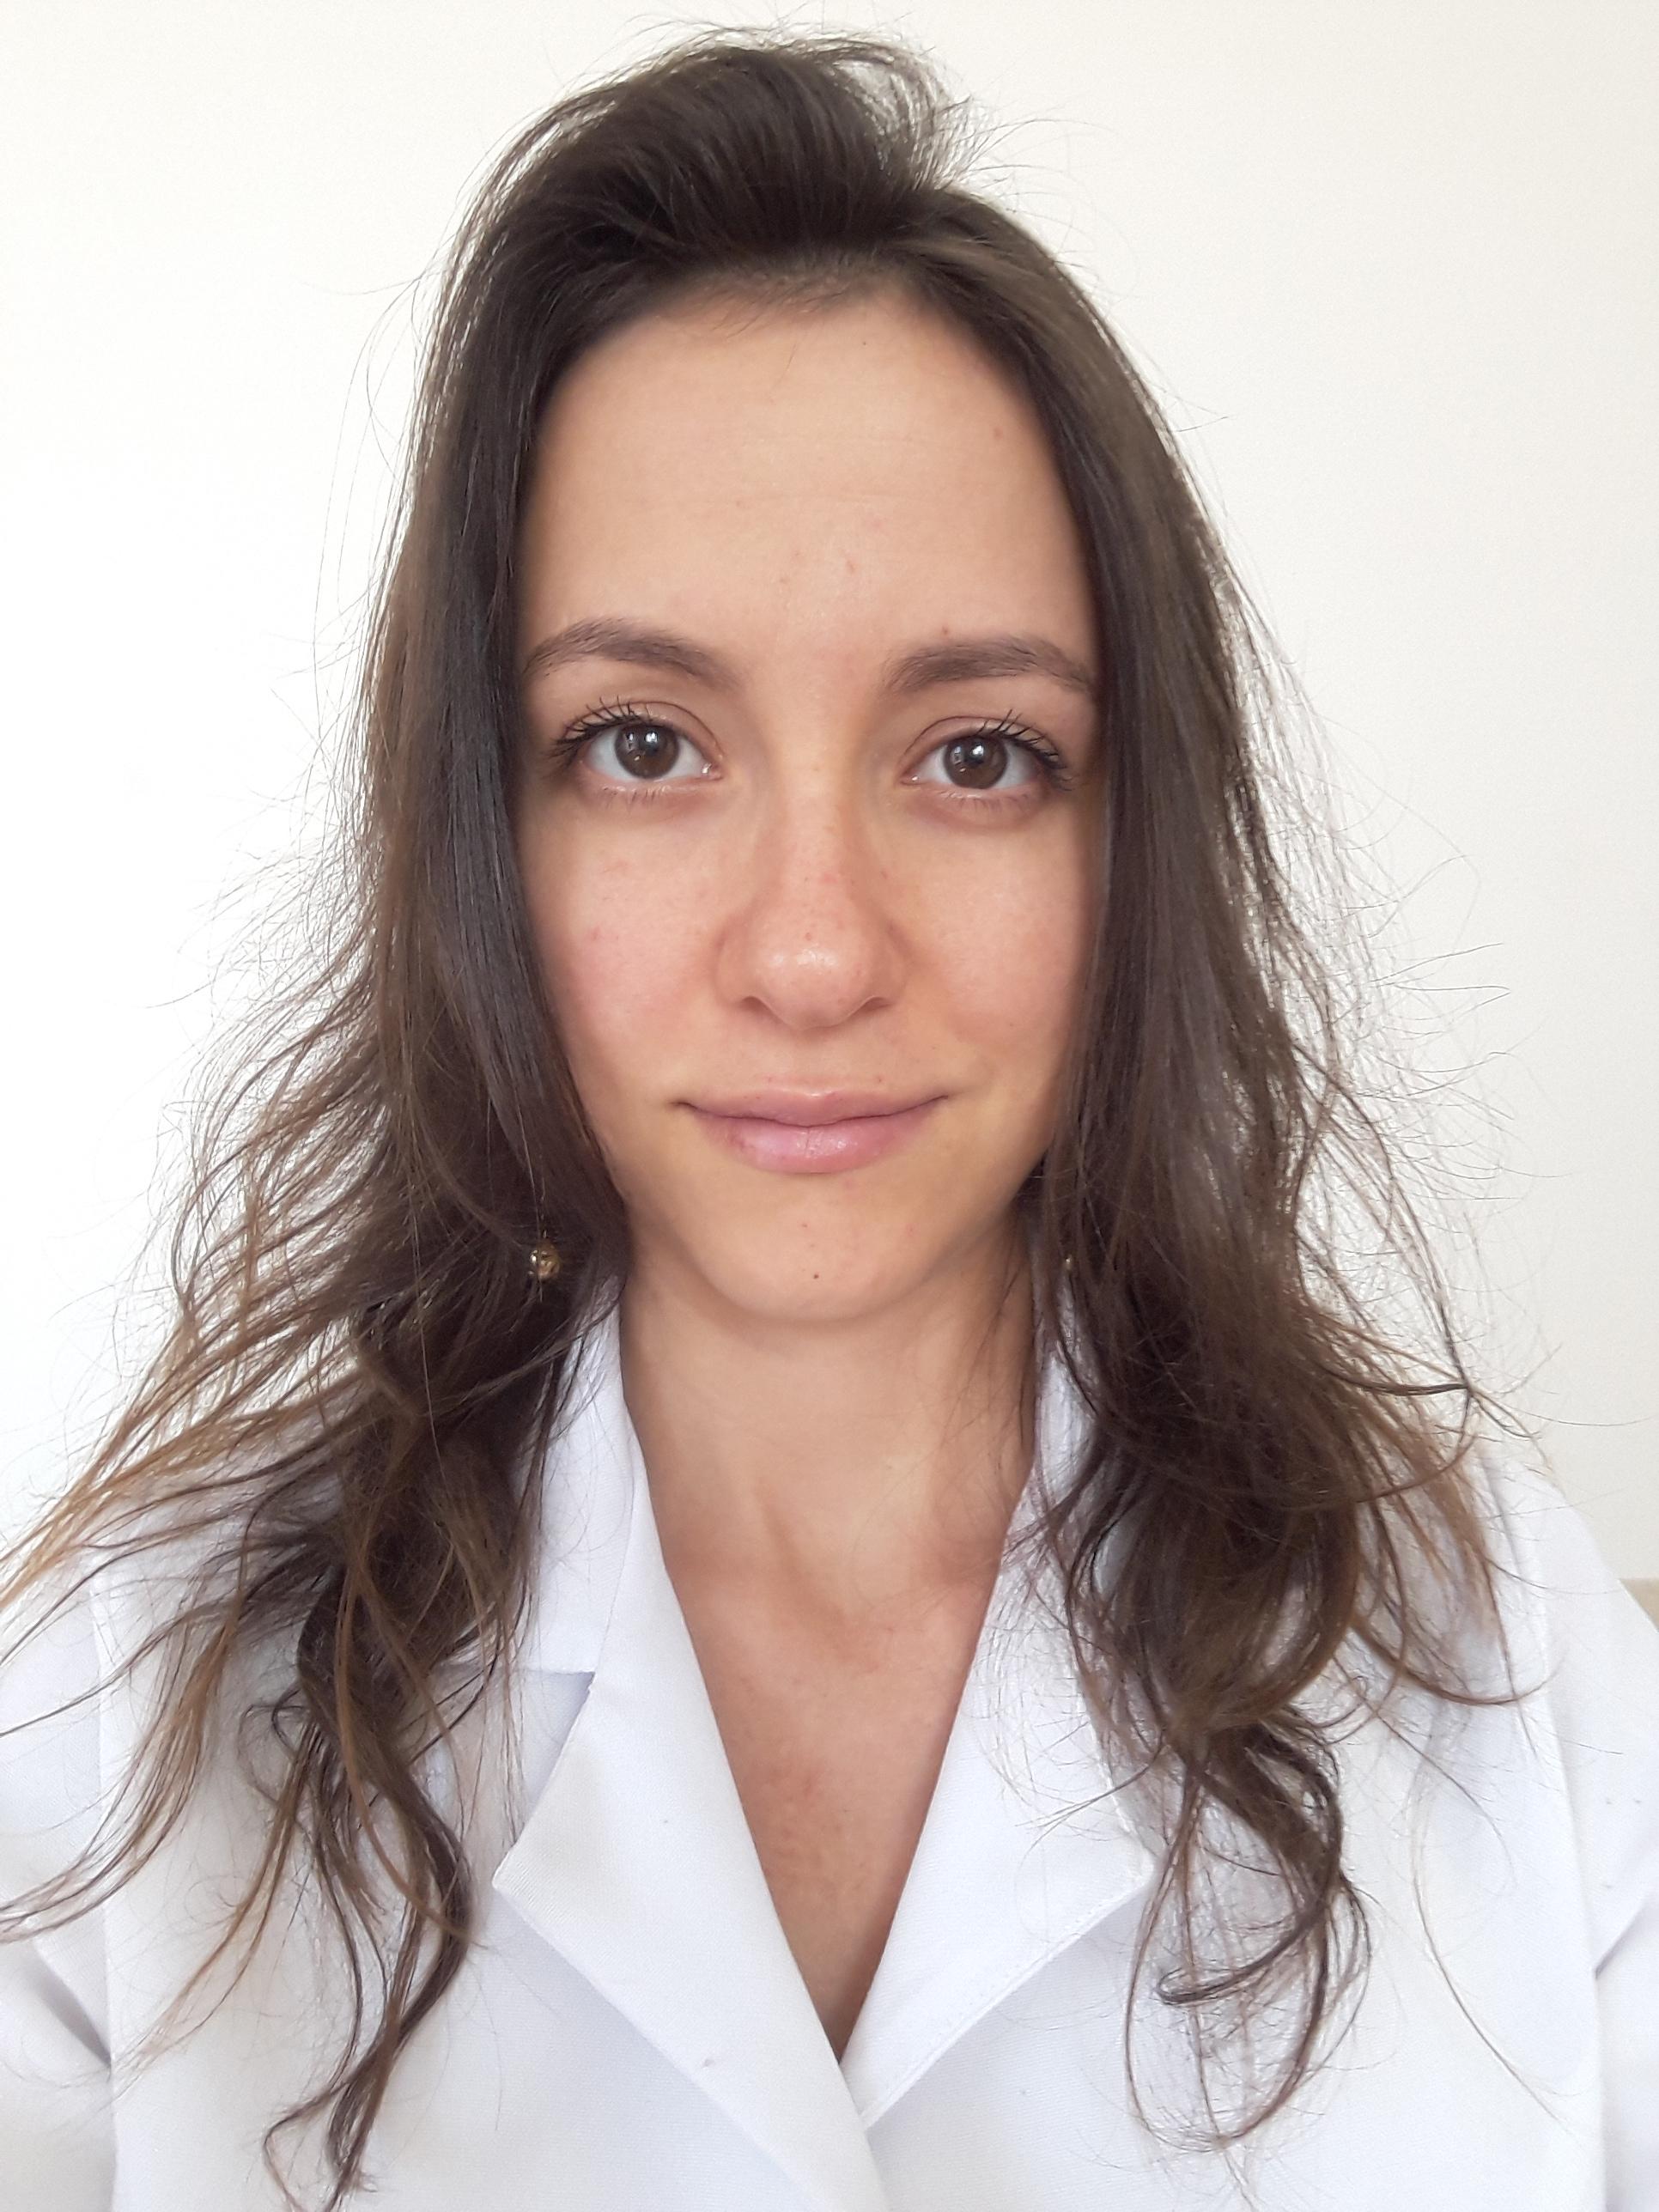 Lara de Paula Palocci